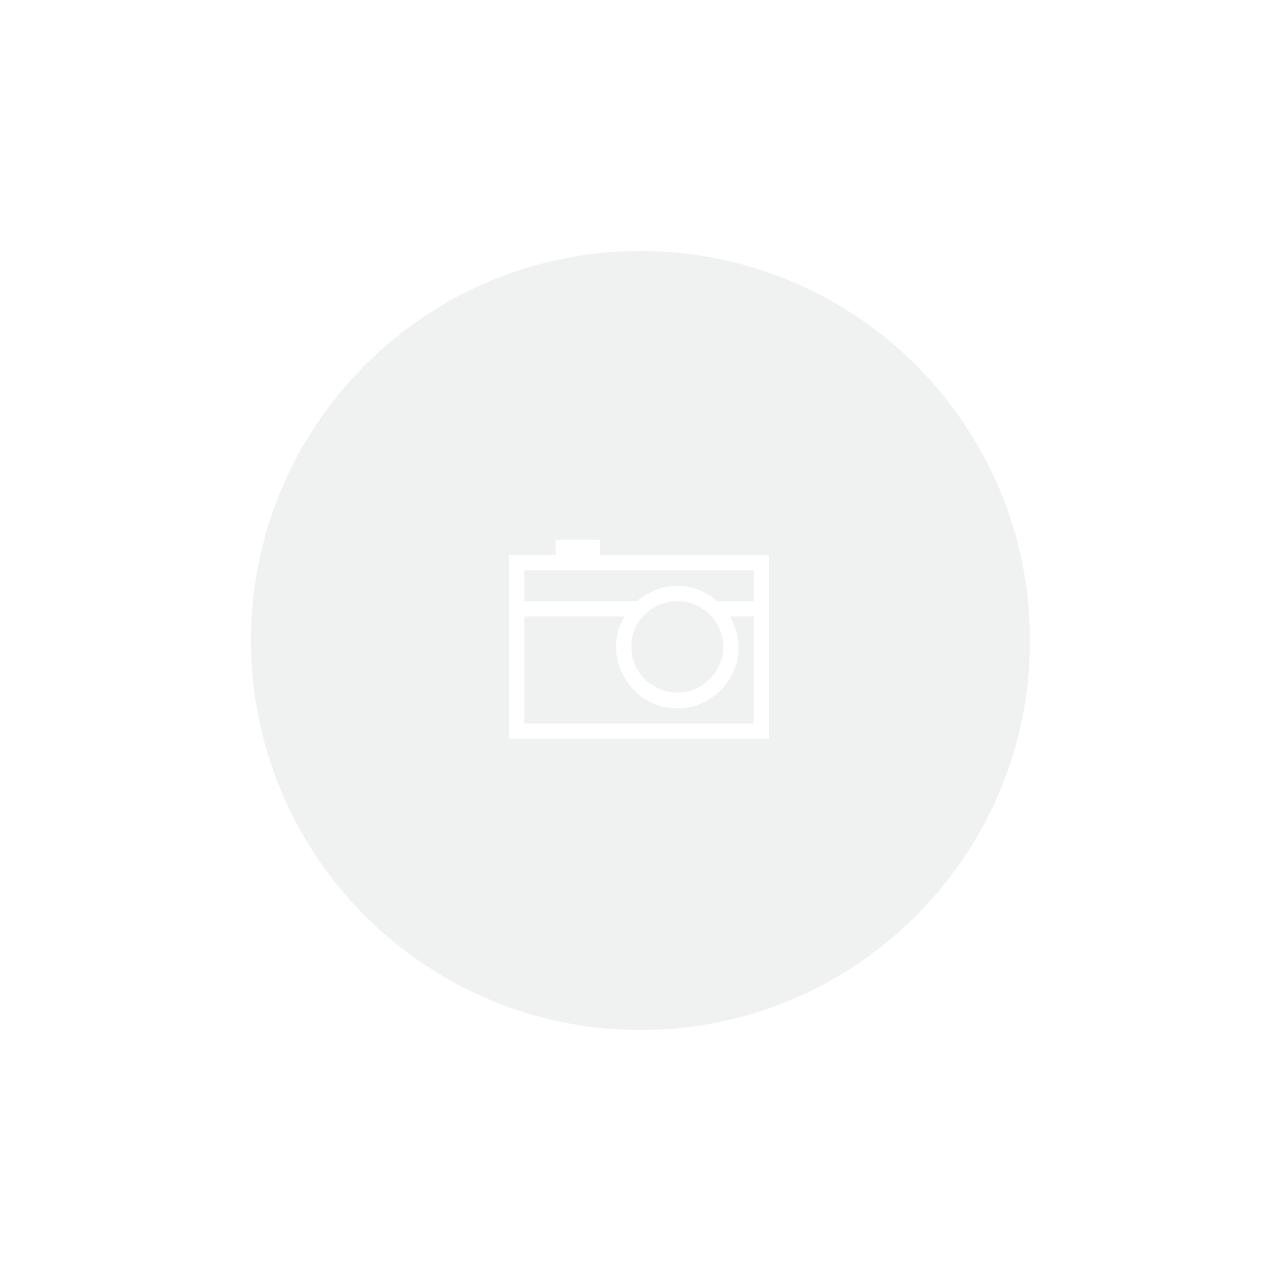 Papel Artesanal Indiano - Ref. 53